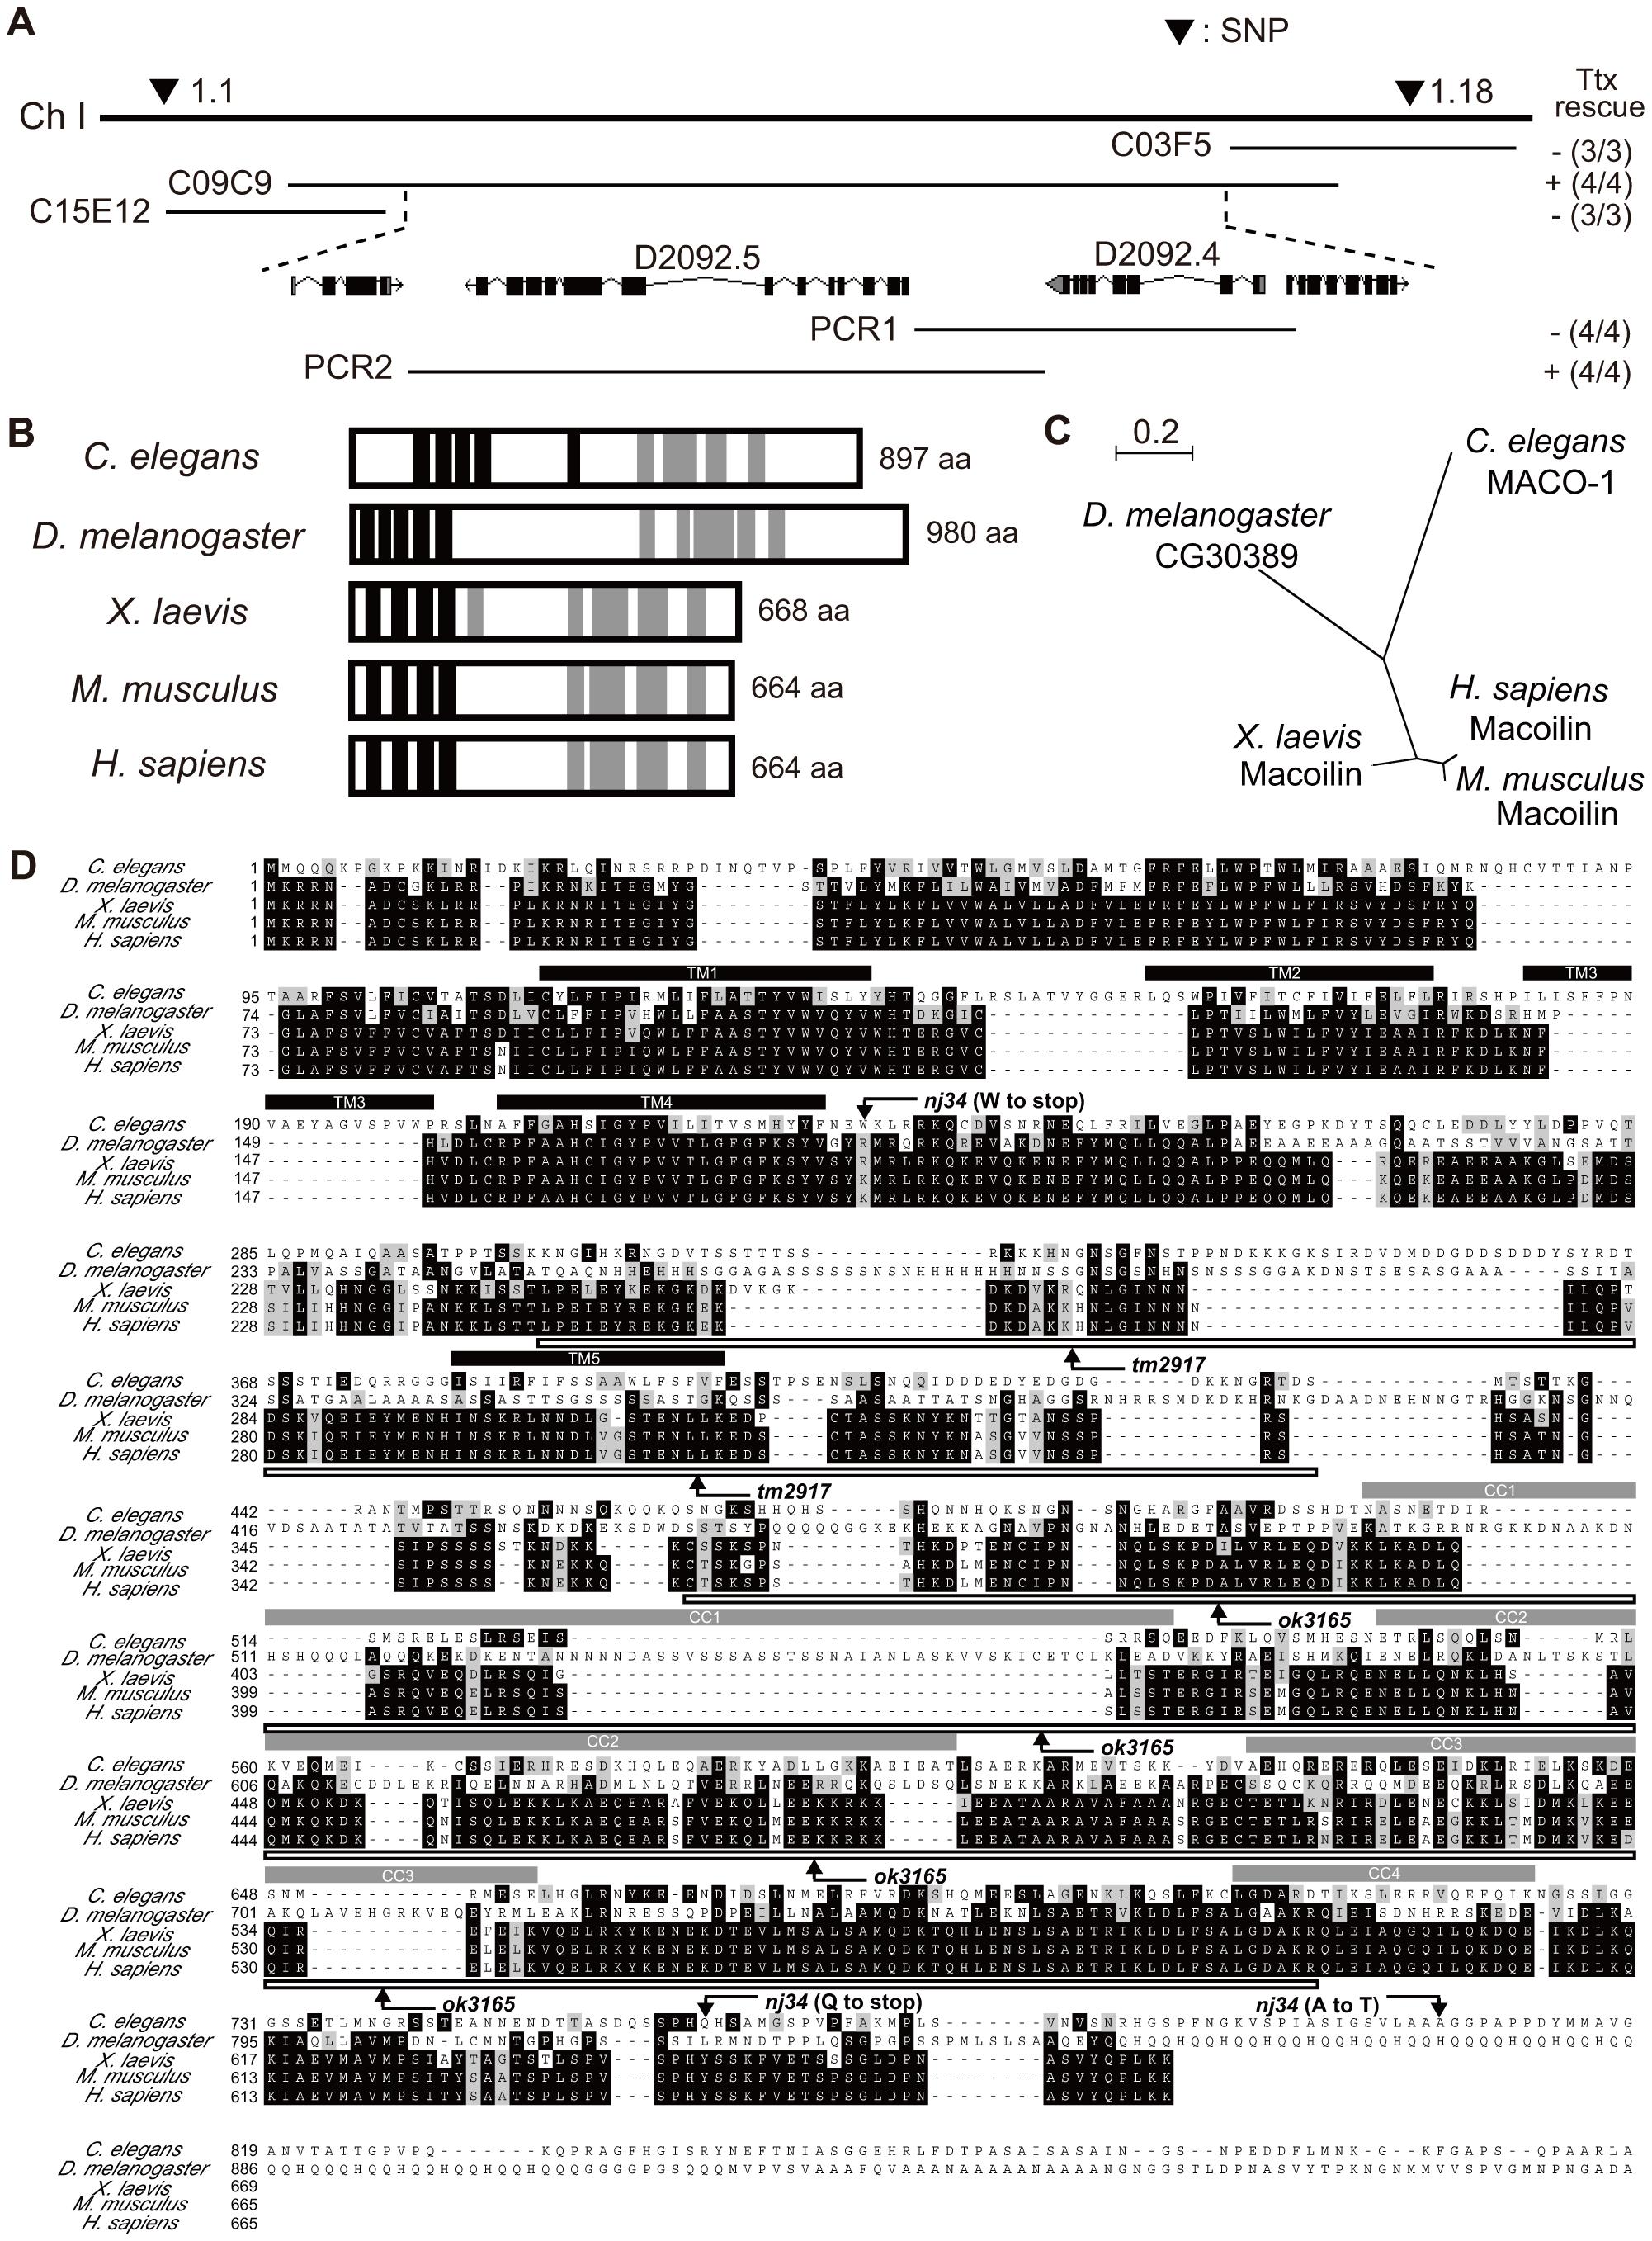 Genetic and molecular analysis of <i>maco-1</i>.